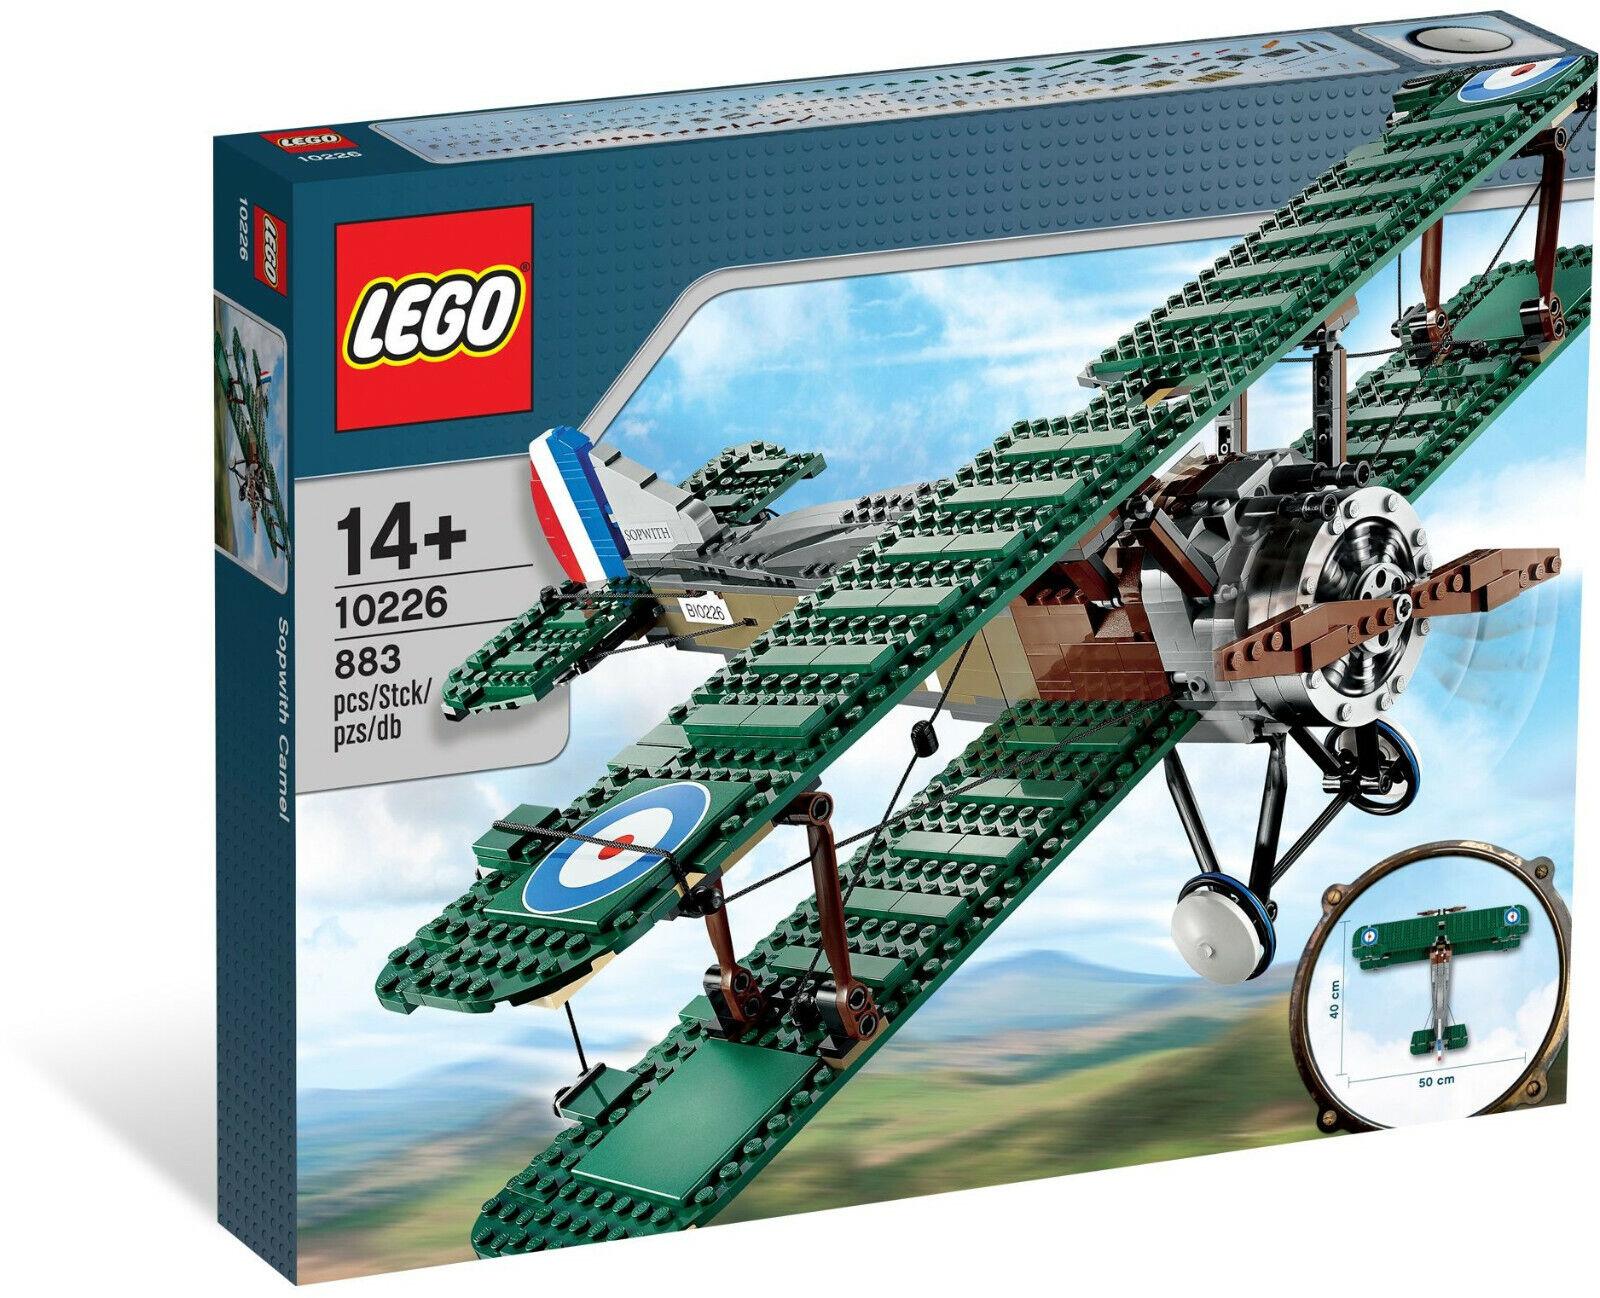 LEGO - SOPWITH CAMEL    10226      RETIrosso     WWI PLANE     BIPLANE    PROPELLER  offrendo il 100%